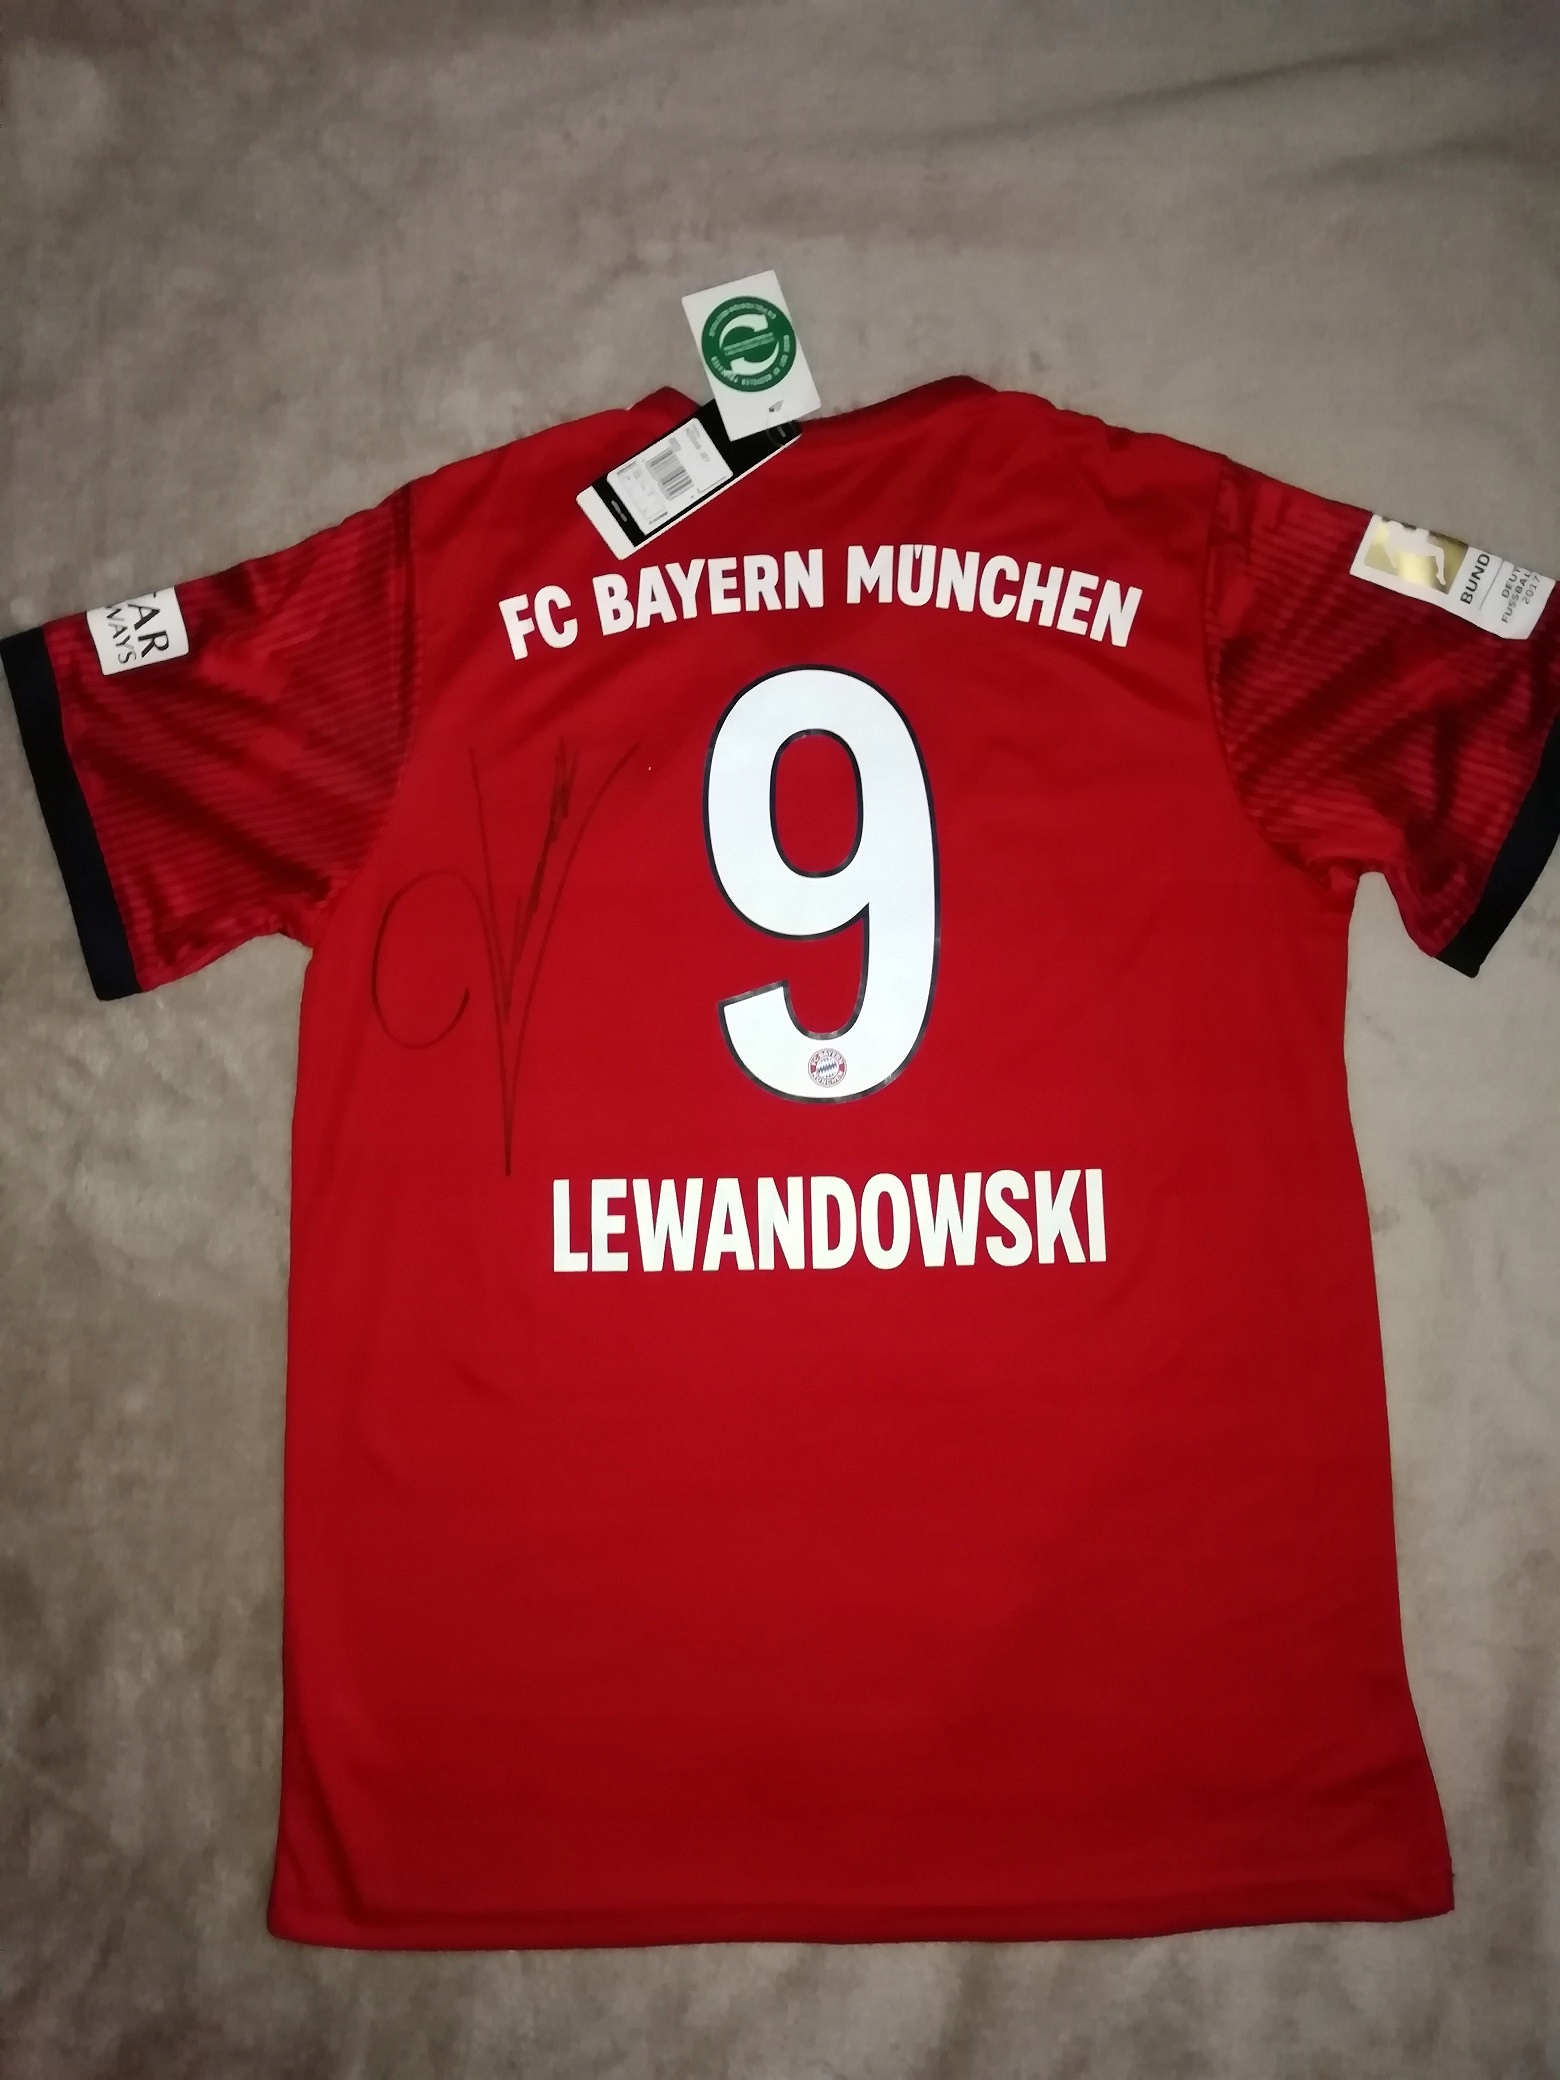 8e9eef8db4f59a Koszulka Bayern 18/19 LEWANDOWSKI z autografem - 7731662636 ...